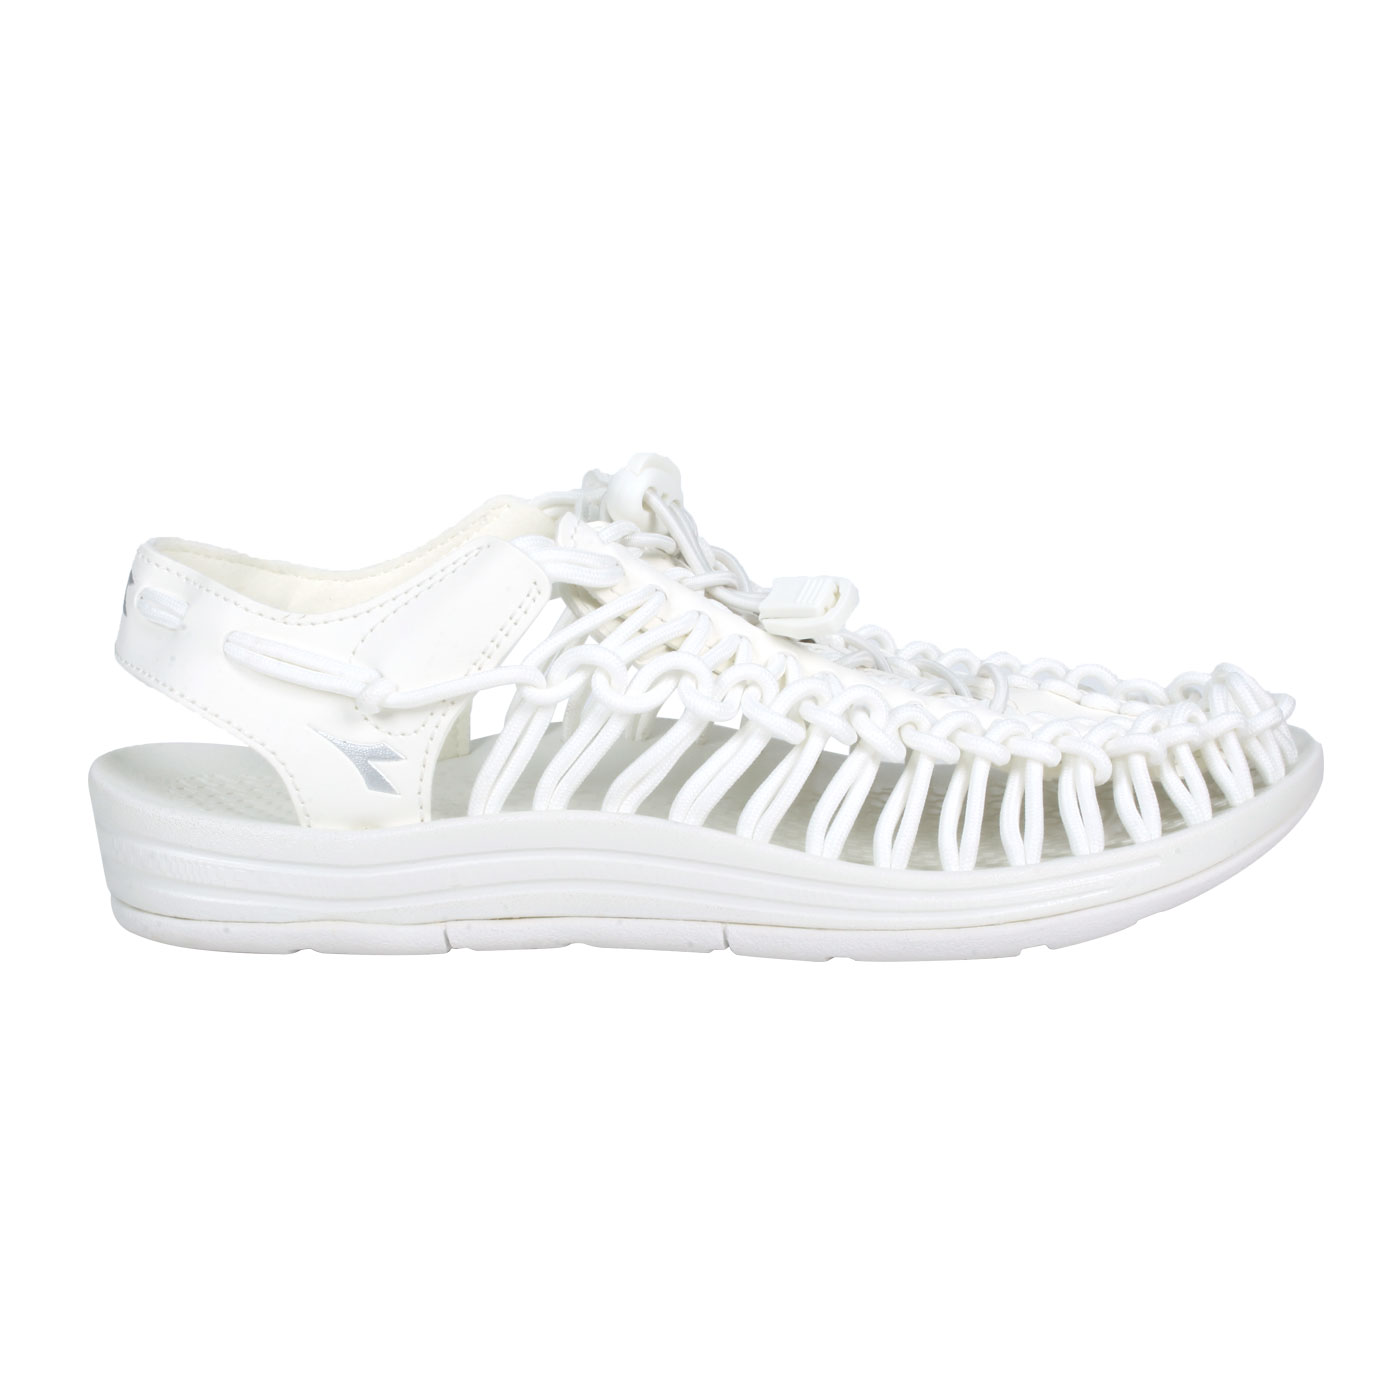 DIADORA 女款編織涼鞋 DA31663 - 白銀